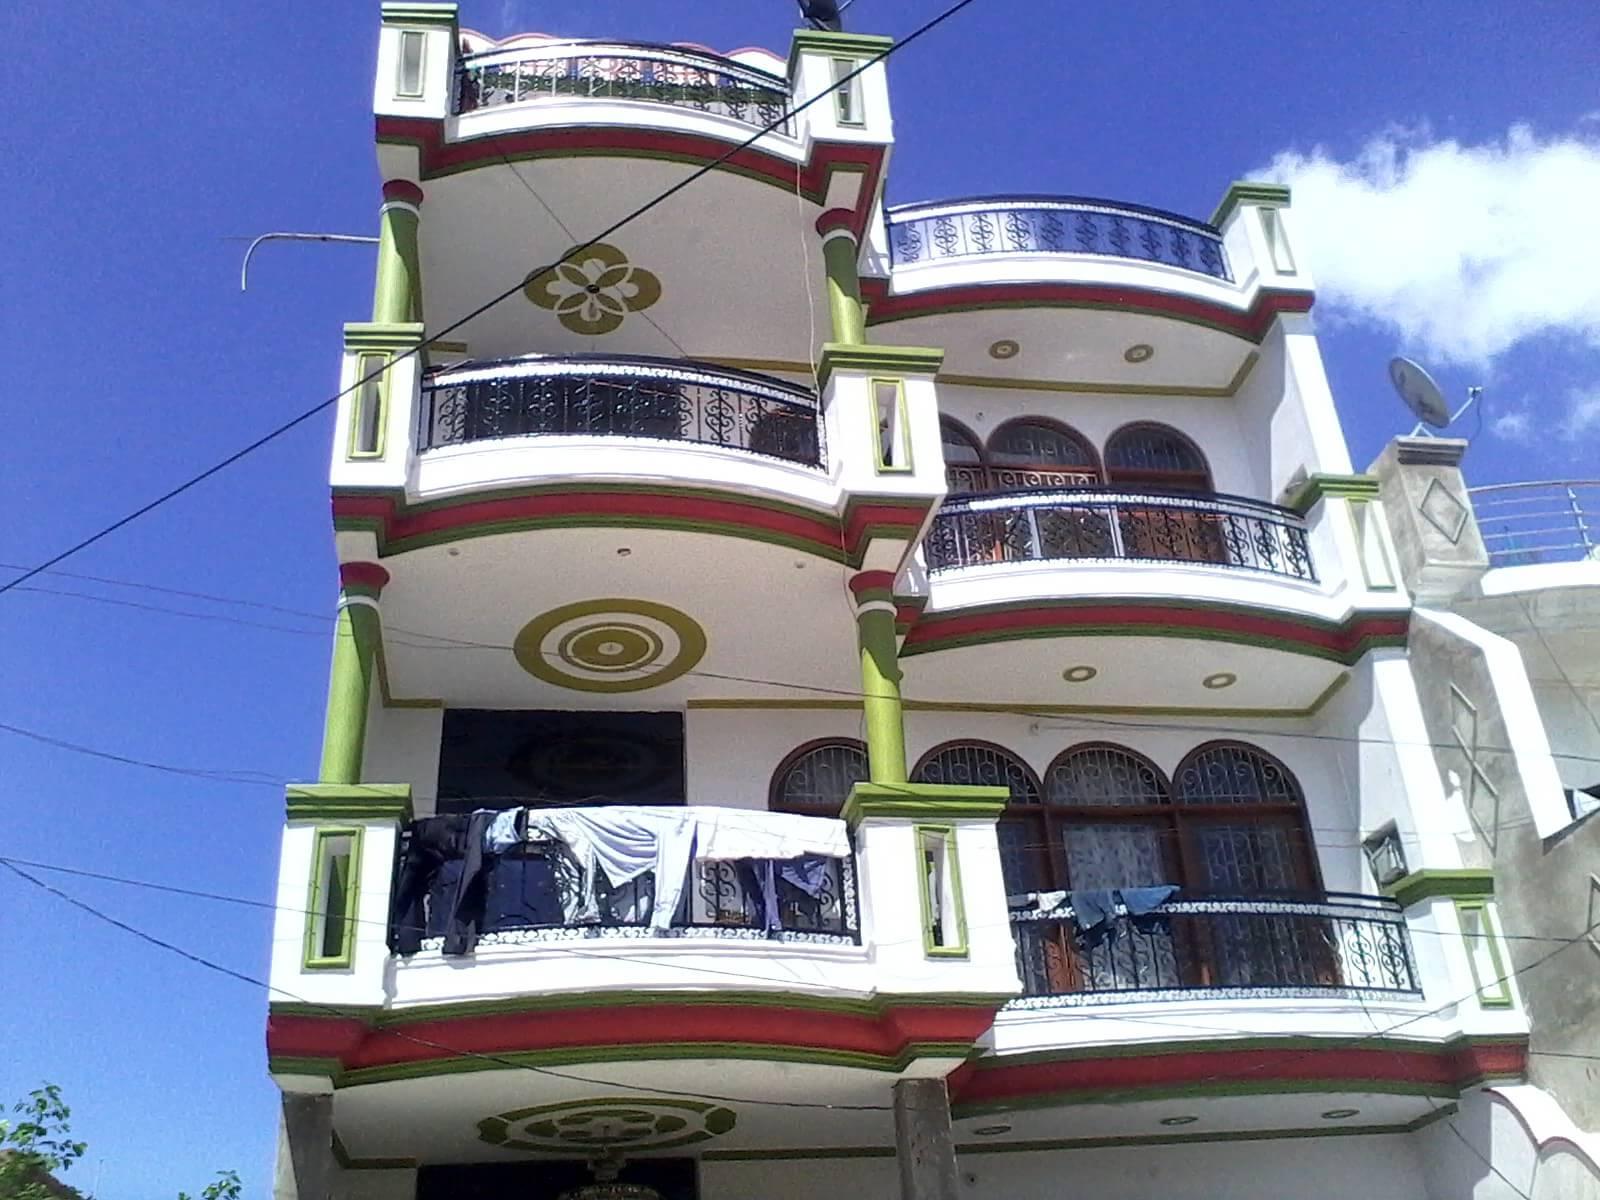 INDEPENDENT HOUSE FOR RENT IN YASHODA NAGAR KANPUR UTTAR PRADESH